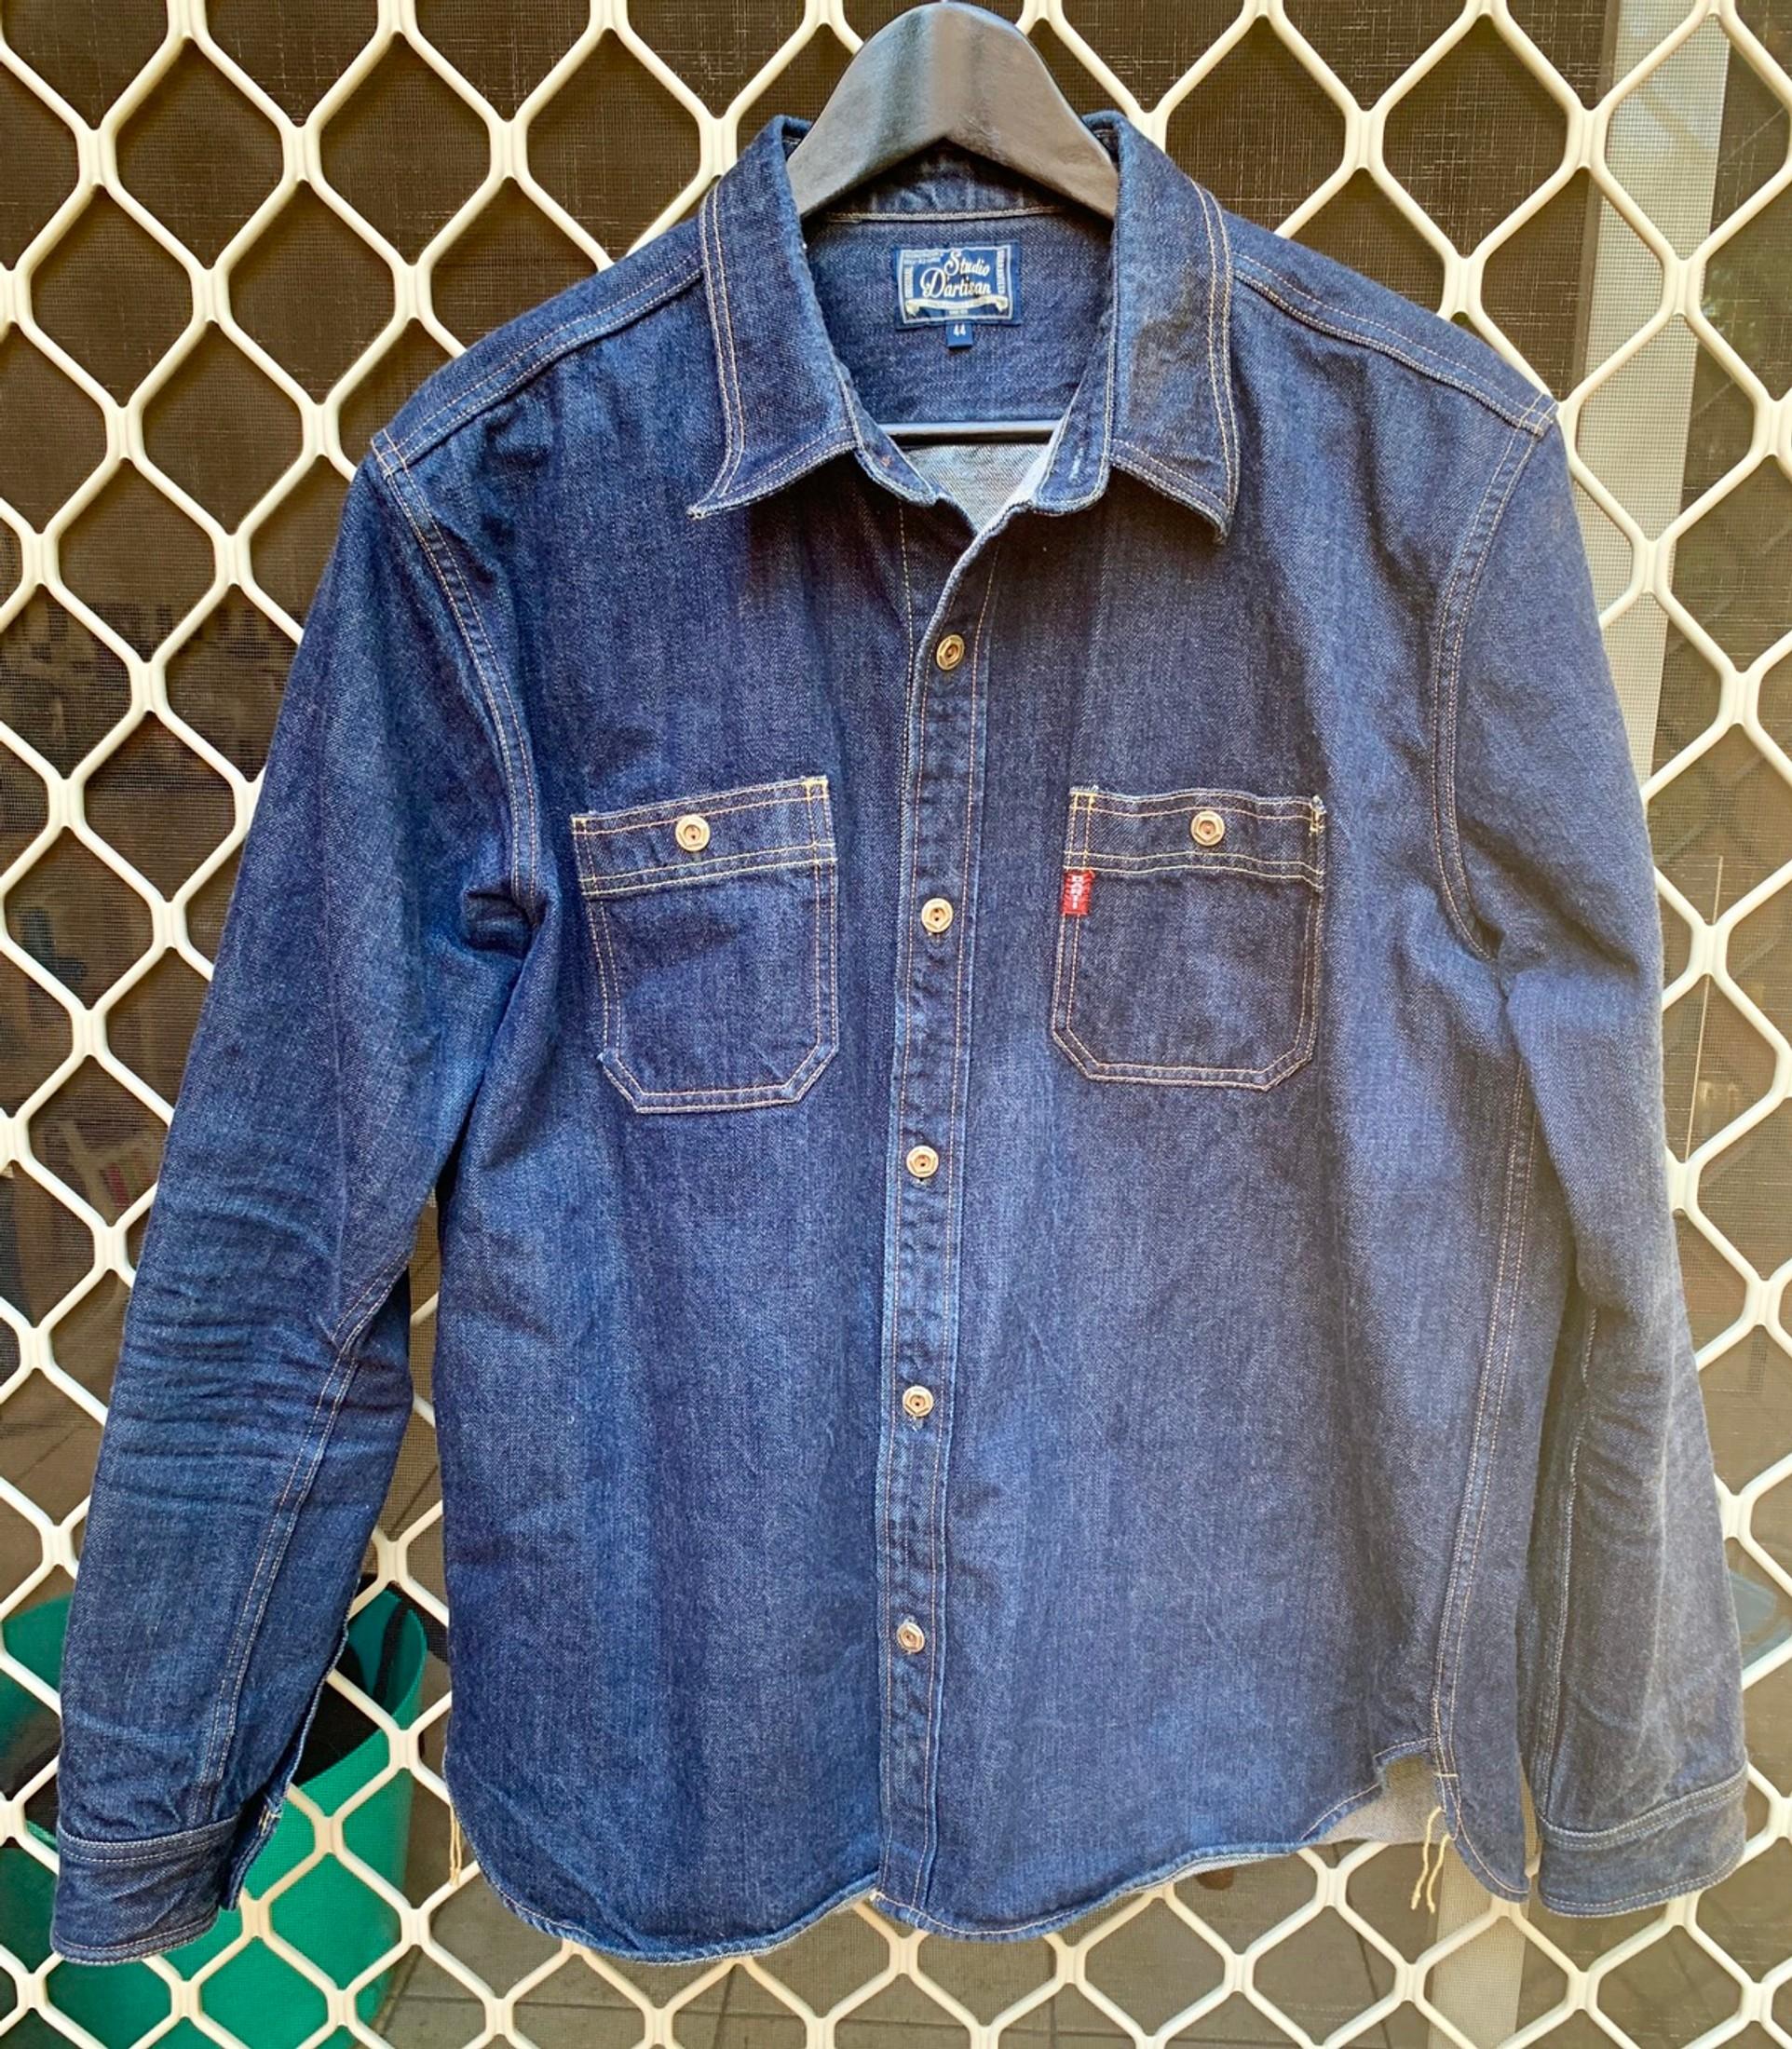 MOUTEN Mens Washed Buttons Denim Chest Pocket Short Sleeve Fashion Shirts